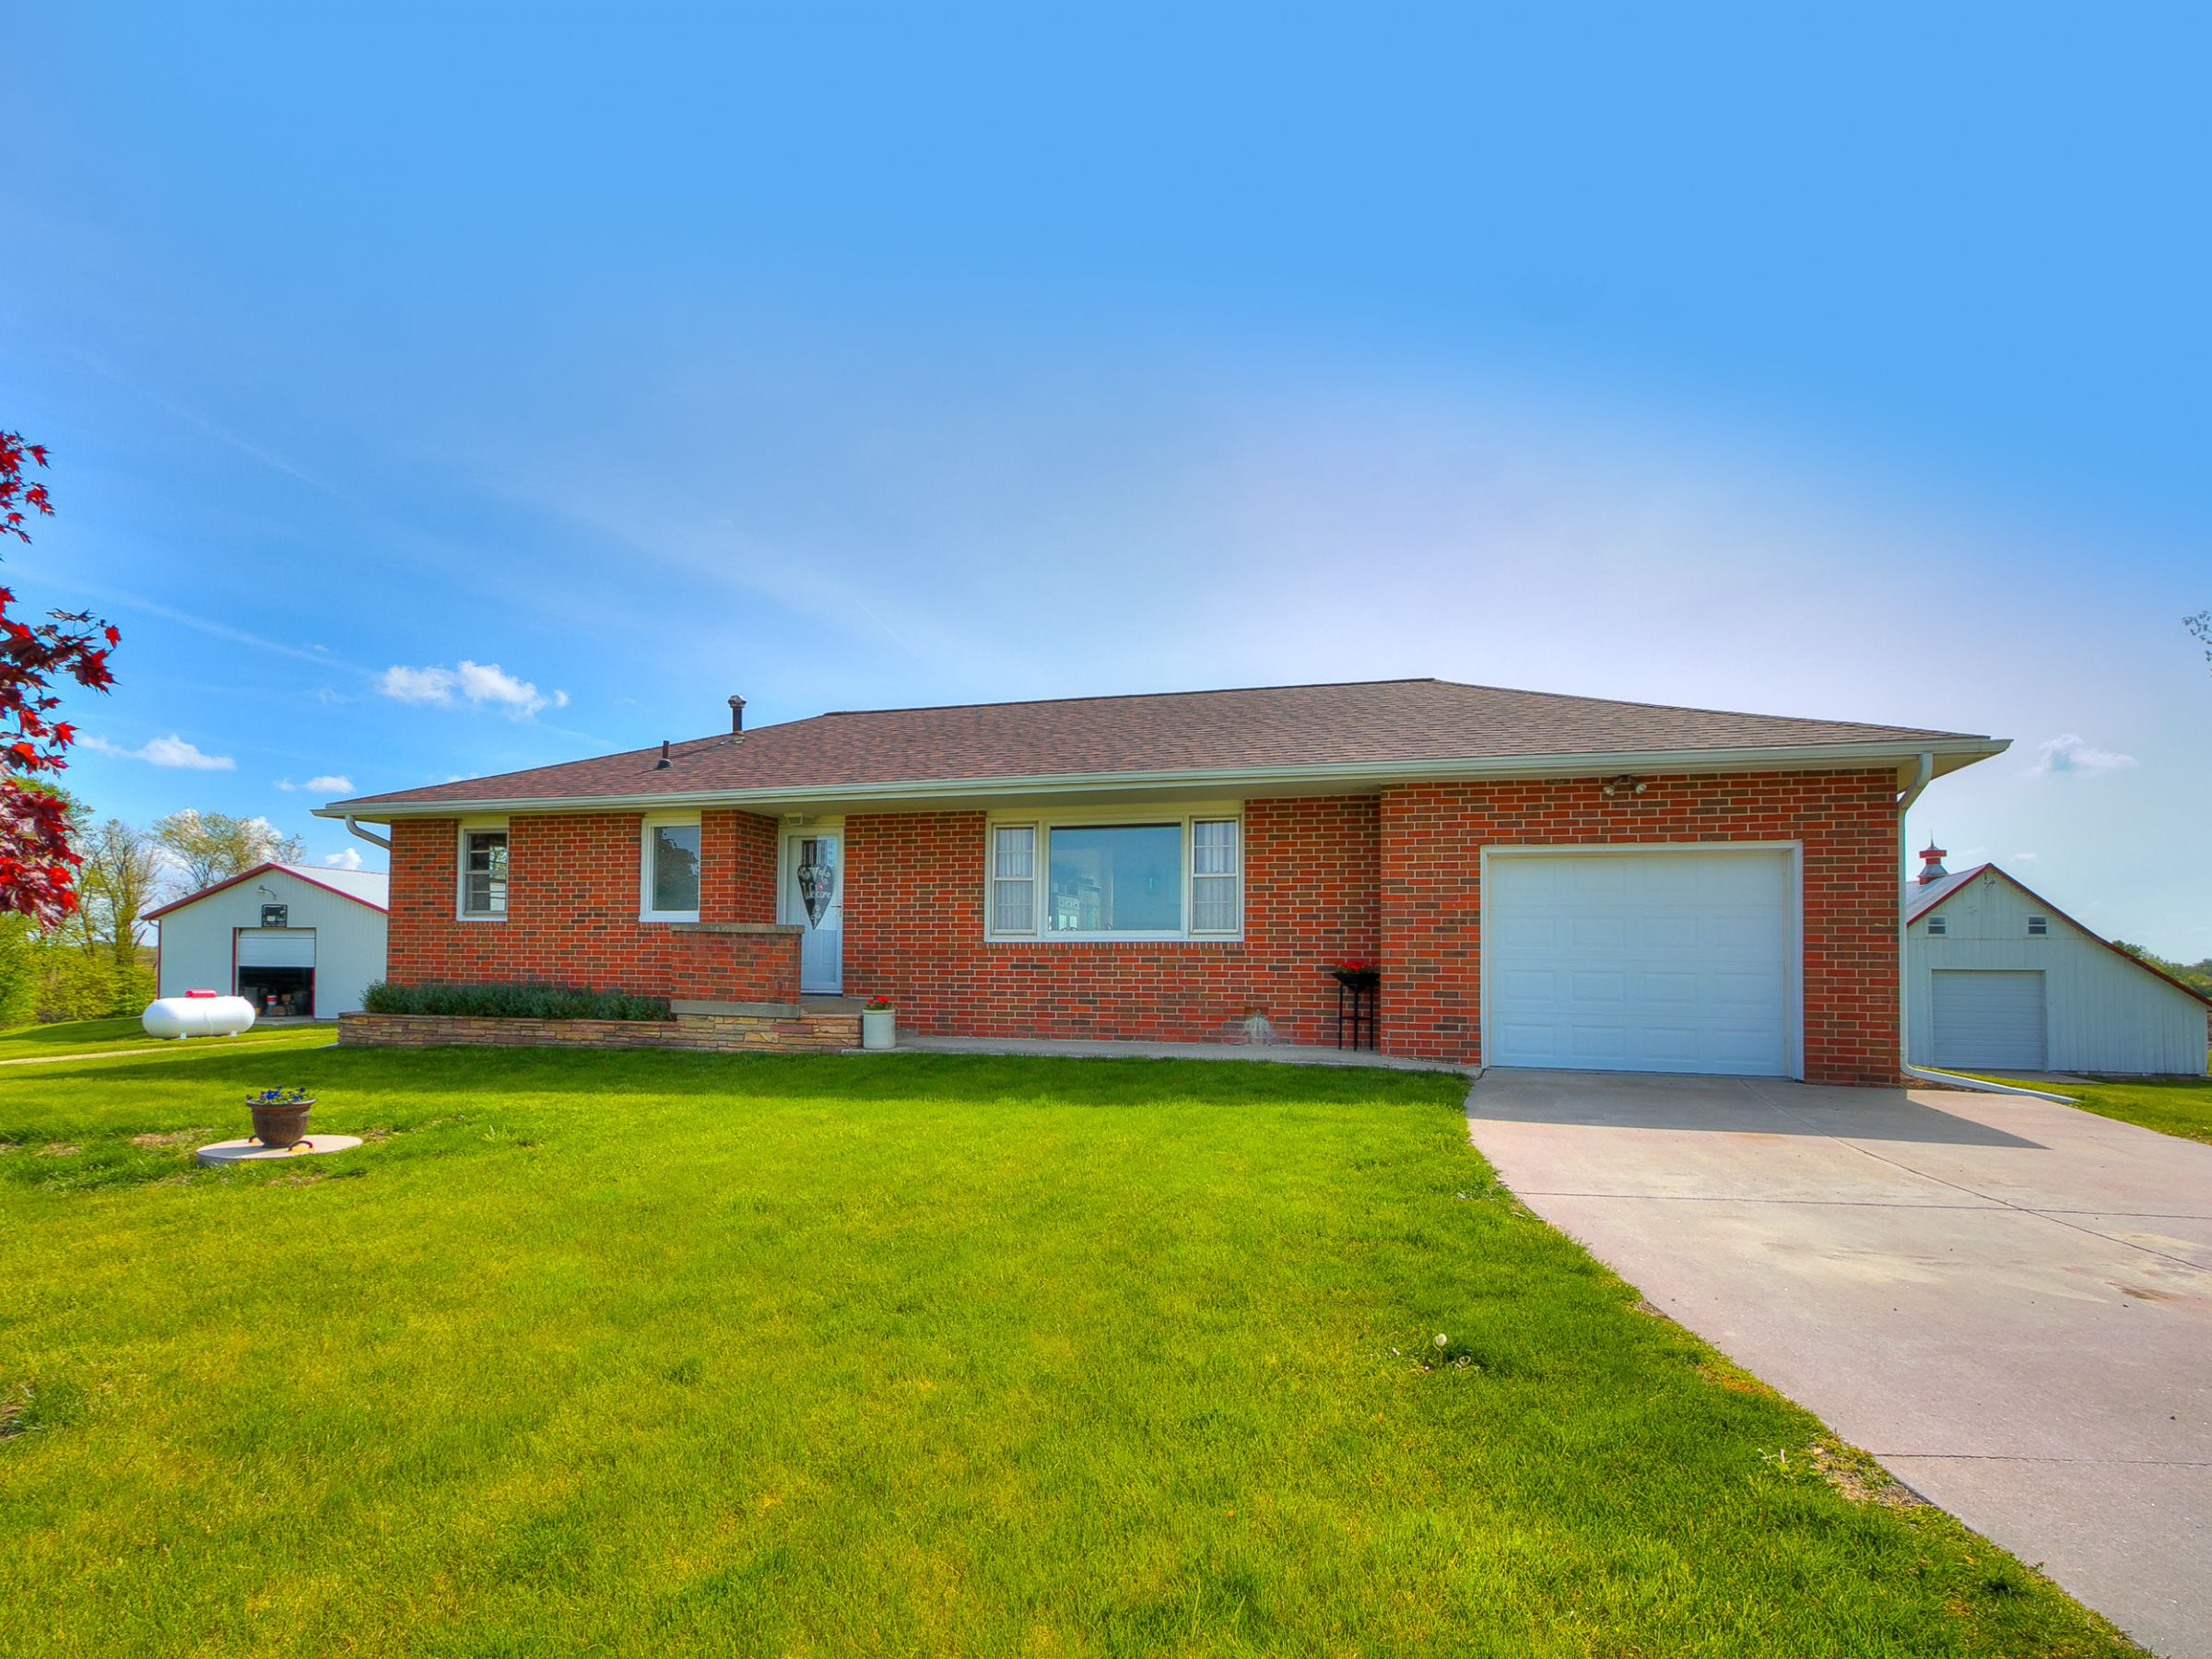 residential-warren-county-iowa-3-acres-listing-number-15516-5-2021-05-12-144636.jpg